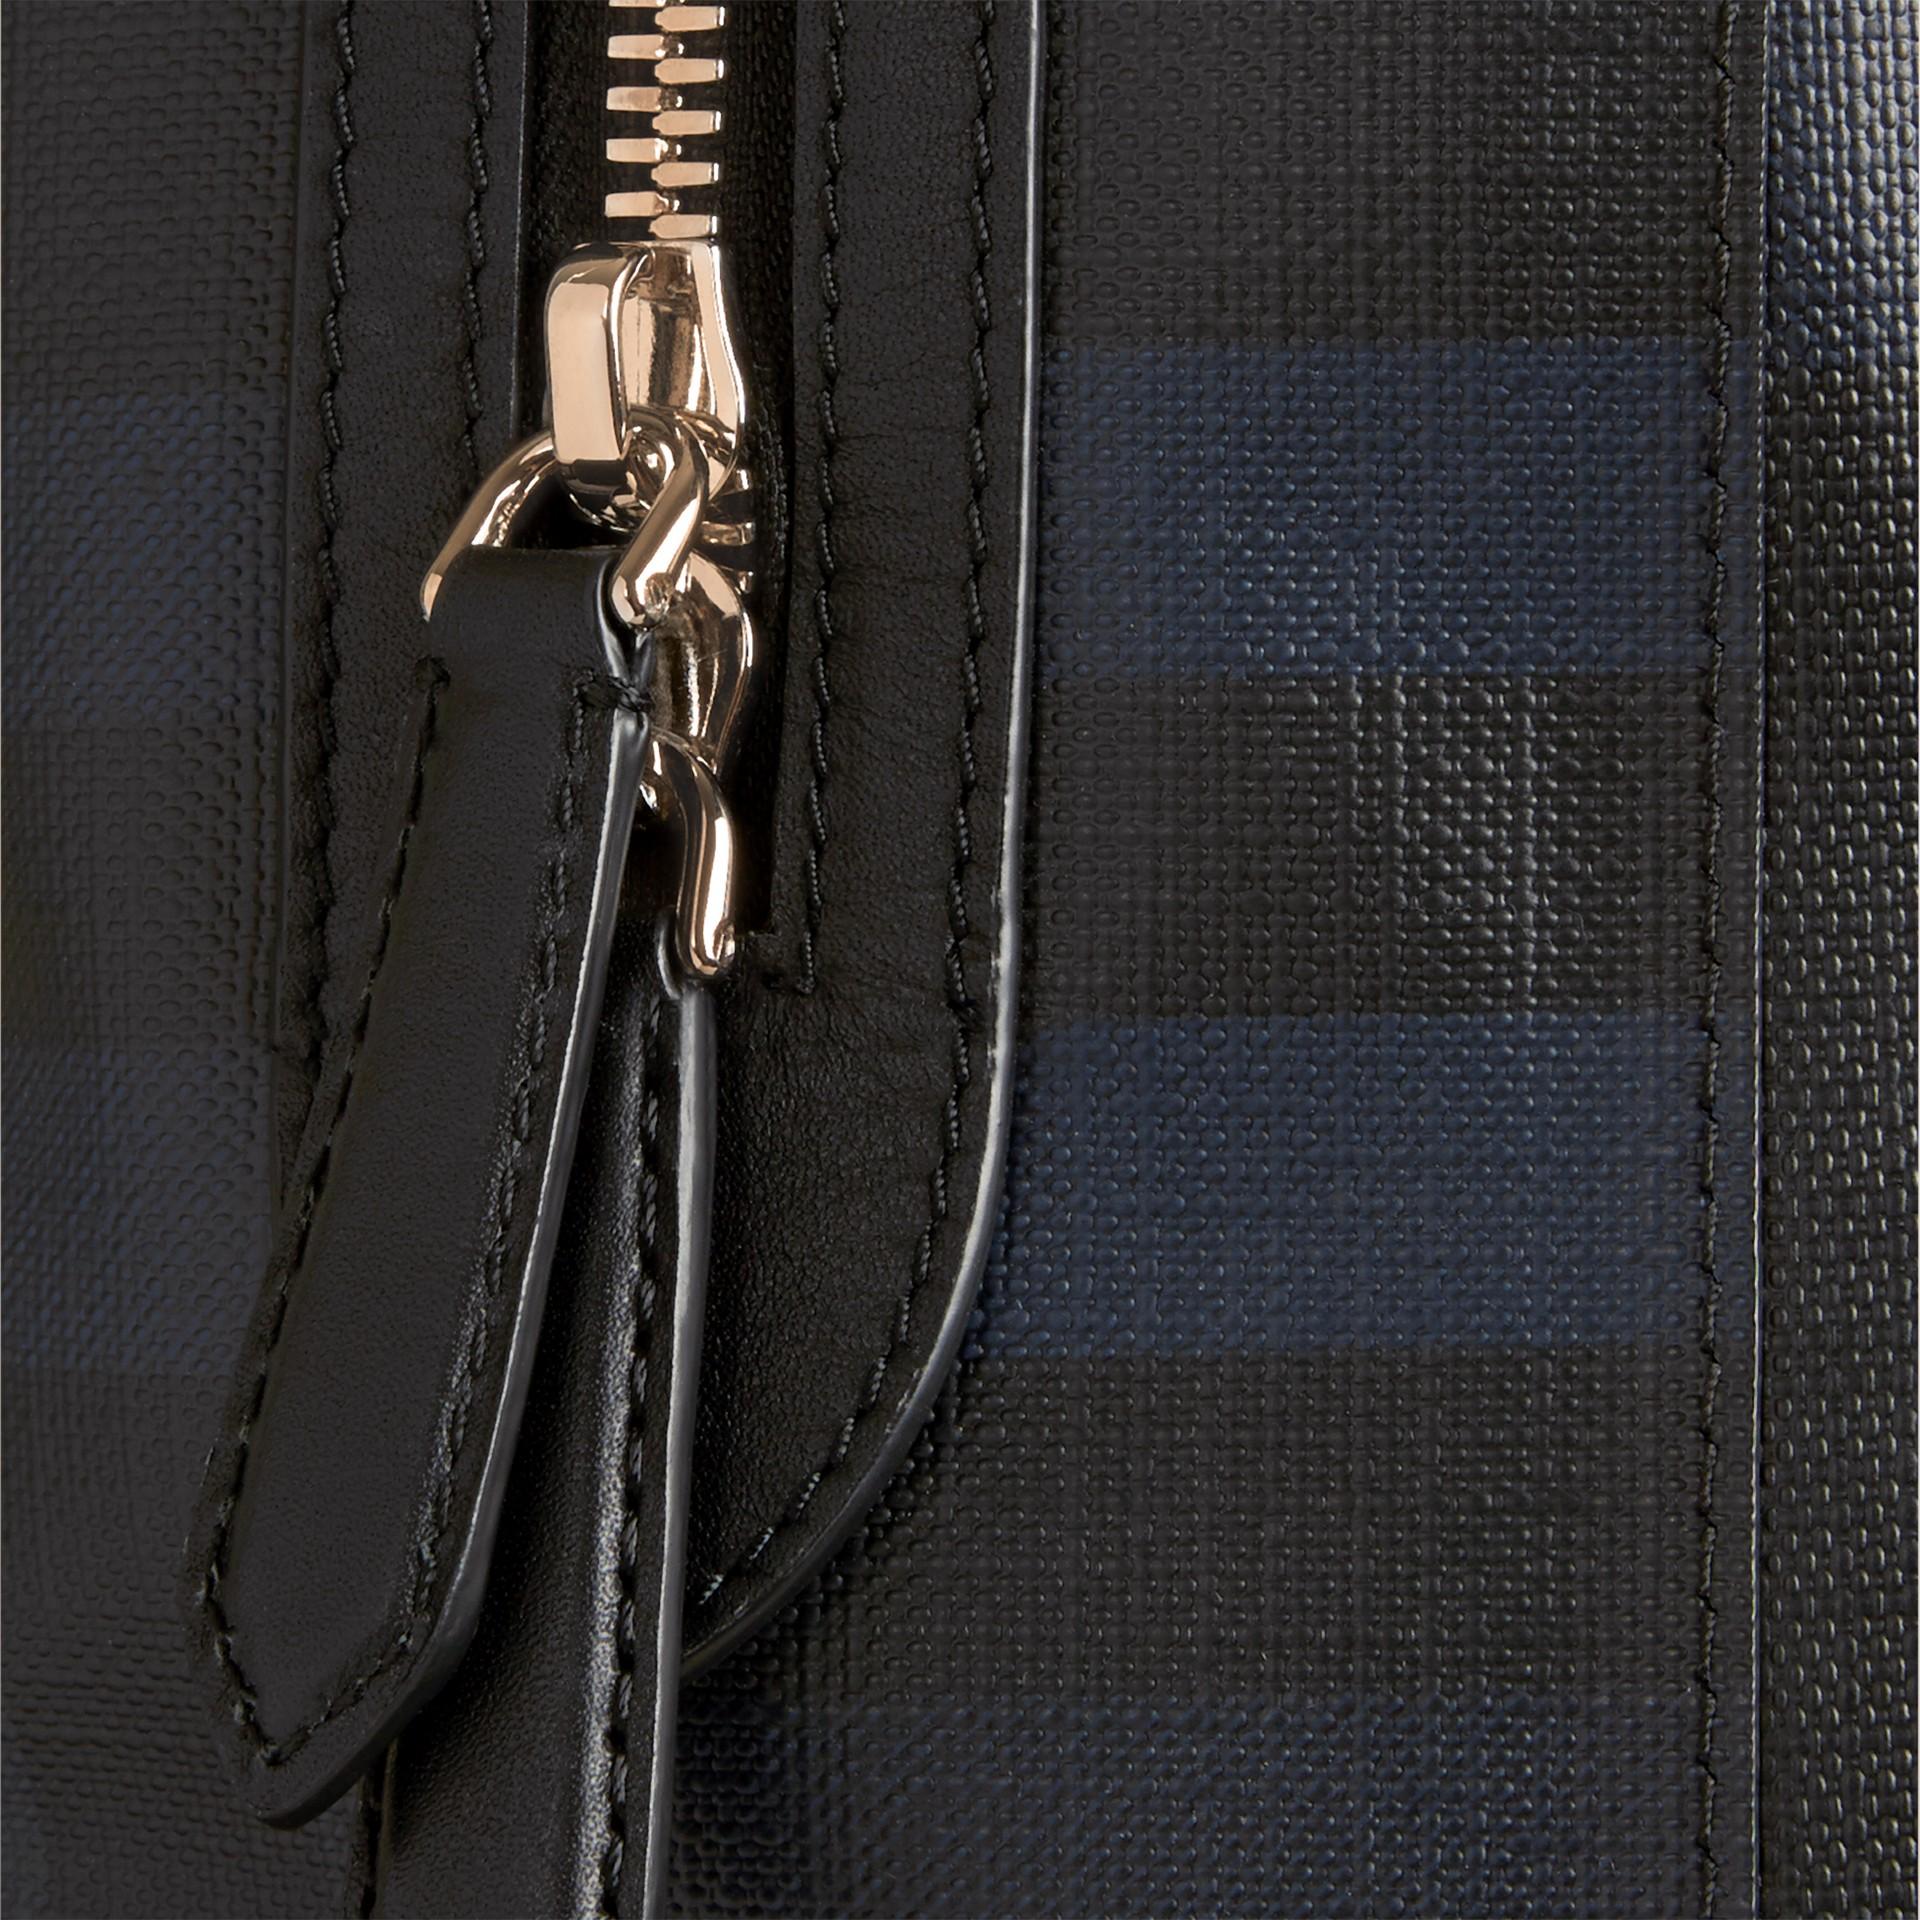 Navy/black London Check Backpack Navy/black - gallery image 2